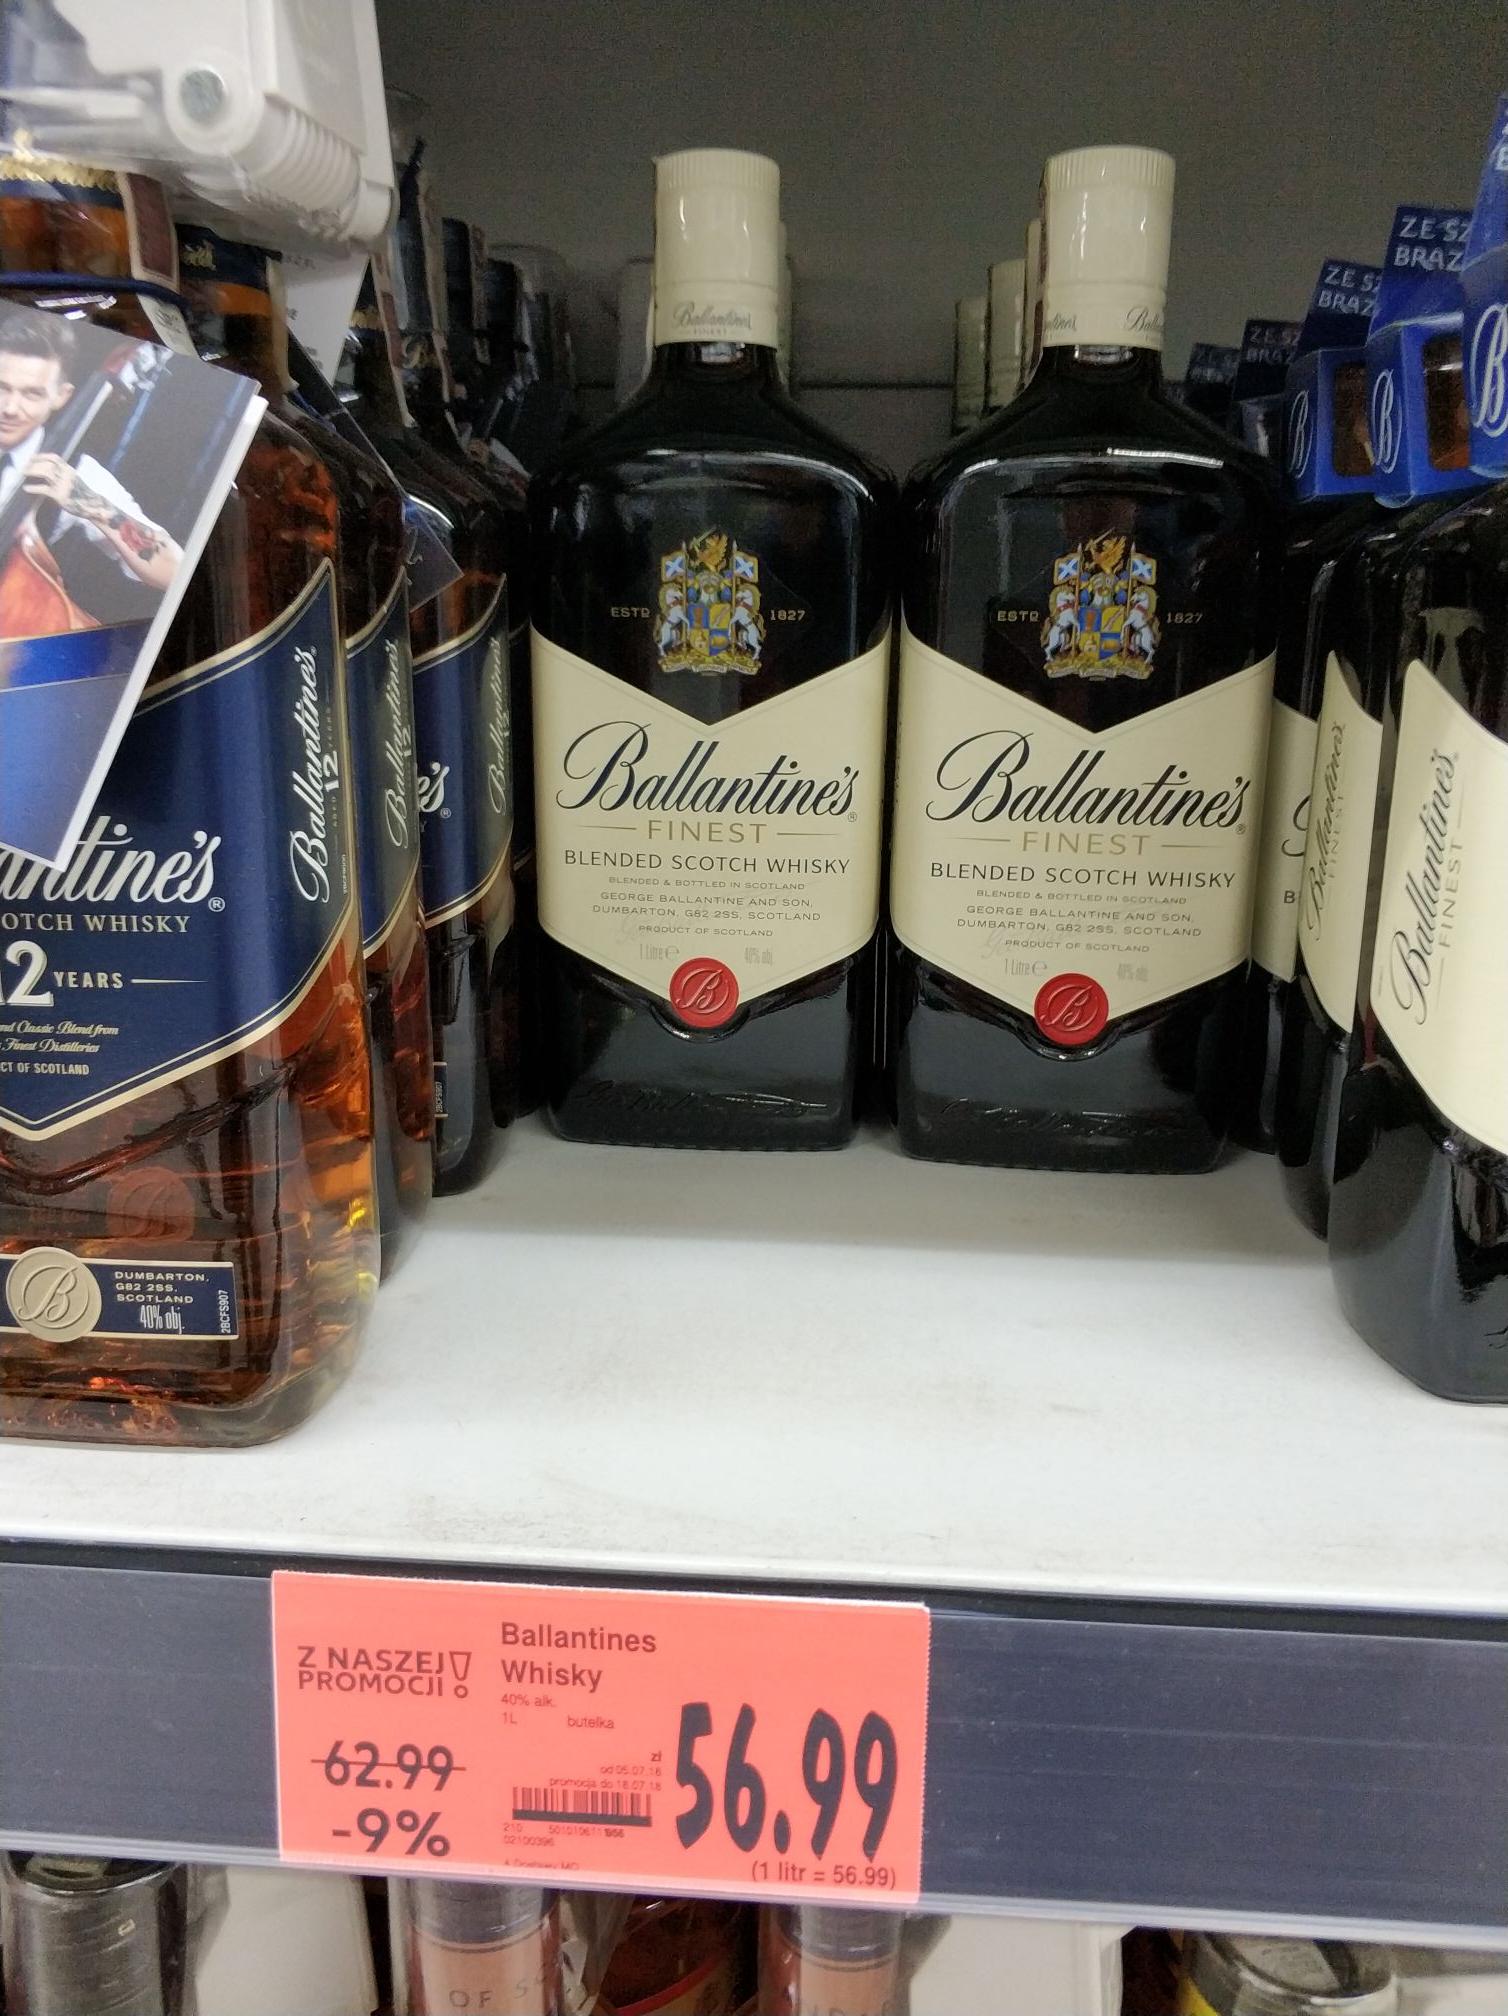 Ballantines Whisky 1 litr Kaufland